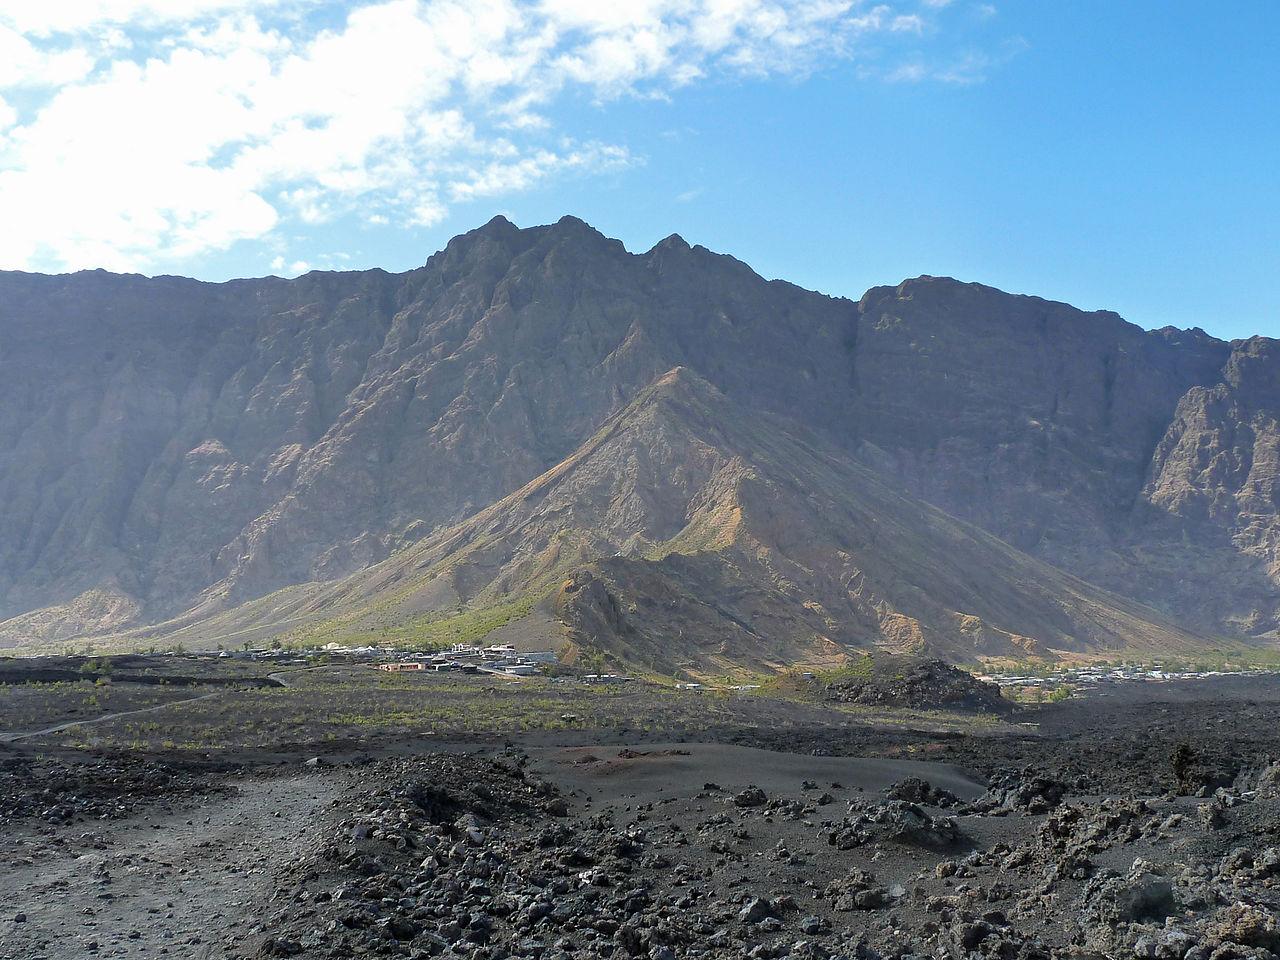 Things to Do in Cape Verde Cha das Caldeiras